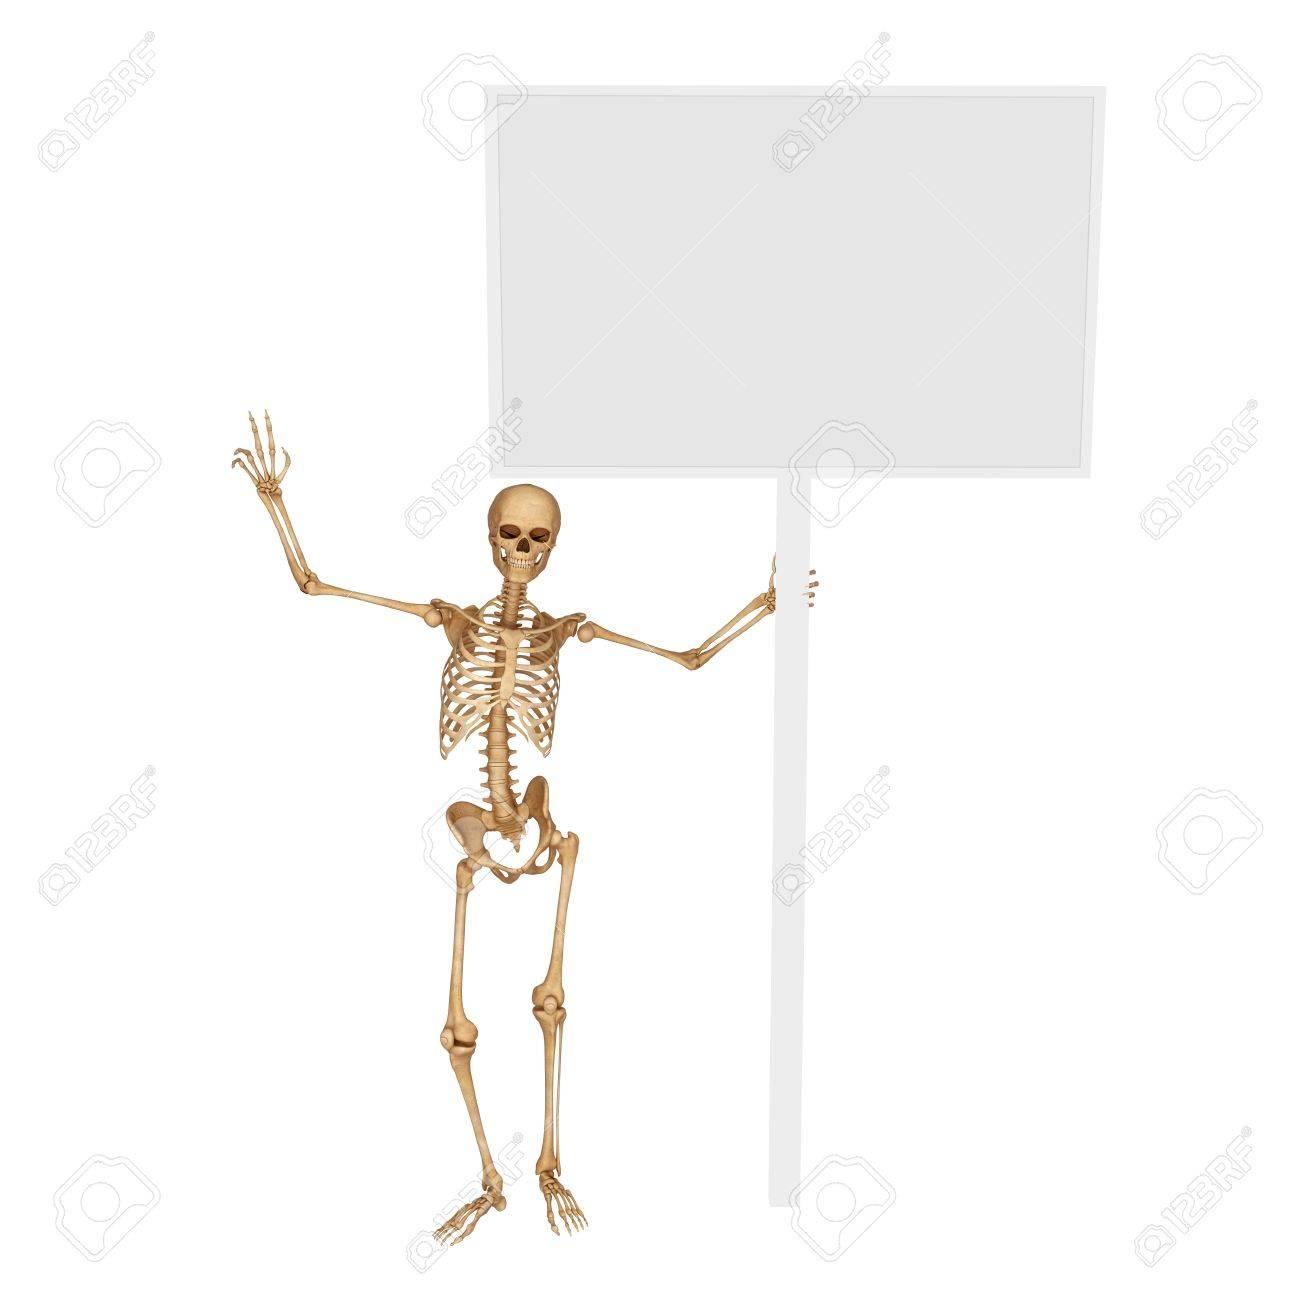 skeleton standing below sign Stock Photo - 15123231